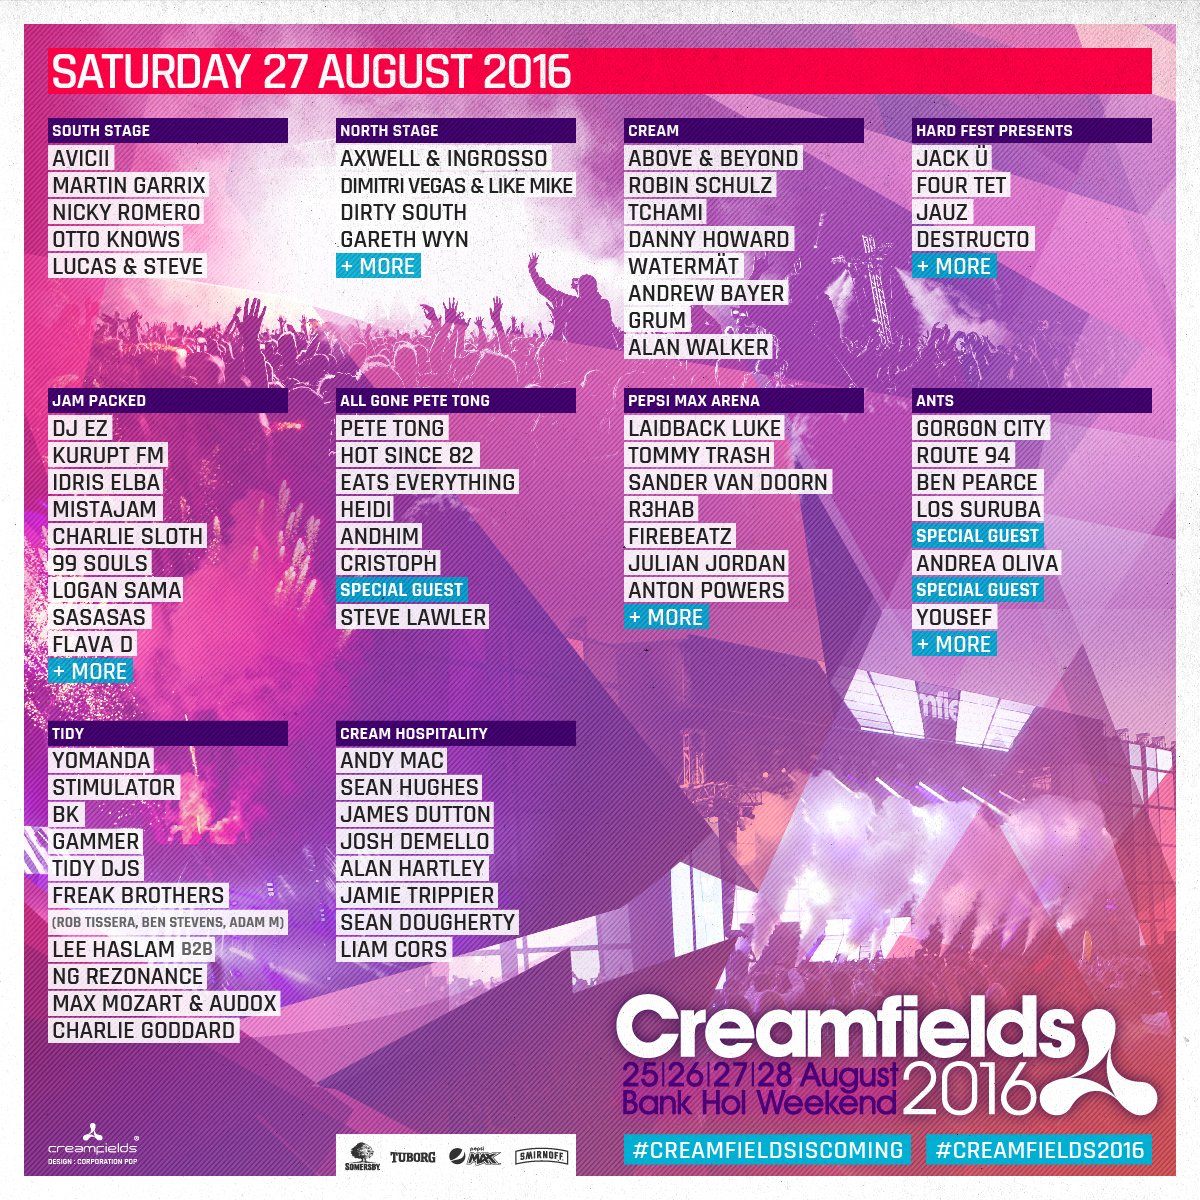 Drum Roll please...#Creamfields2016 line up has landed. #Creamfieldsiscoming https://t.co/Rk7F7miskk https://t.co/kdvgiOUUOT